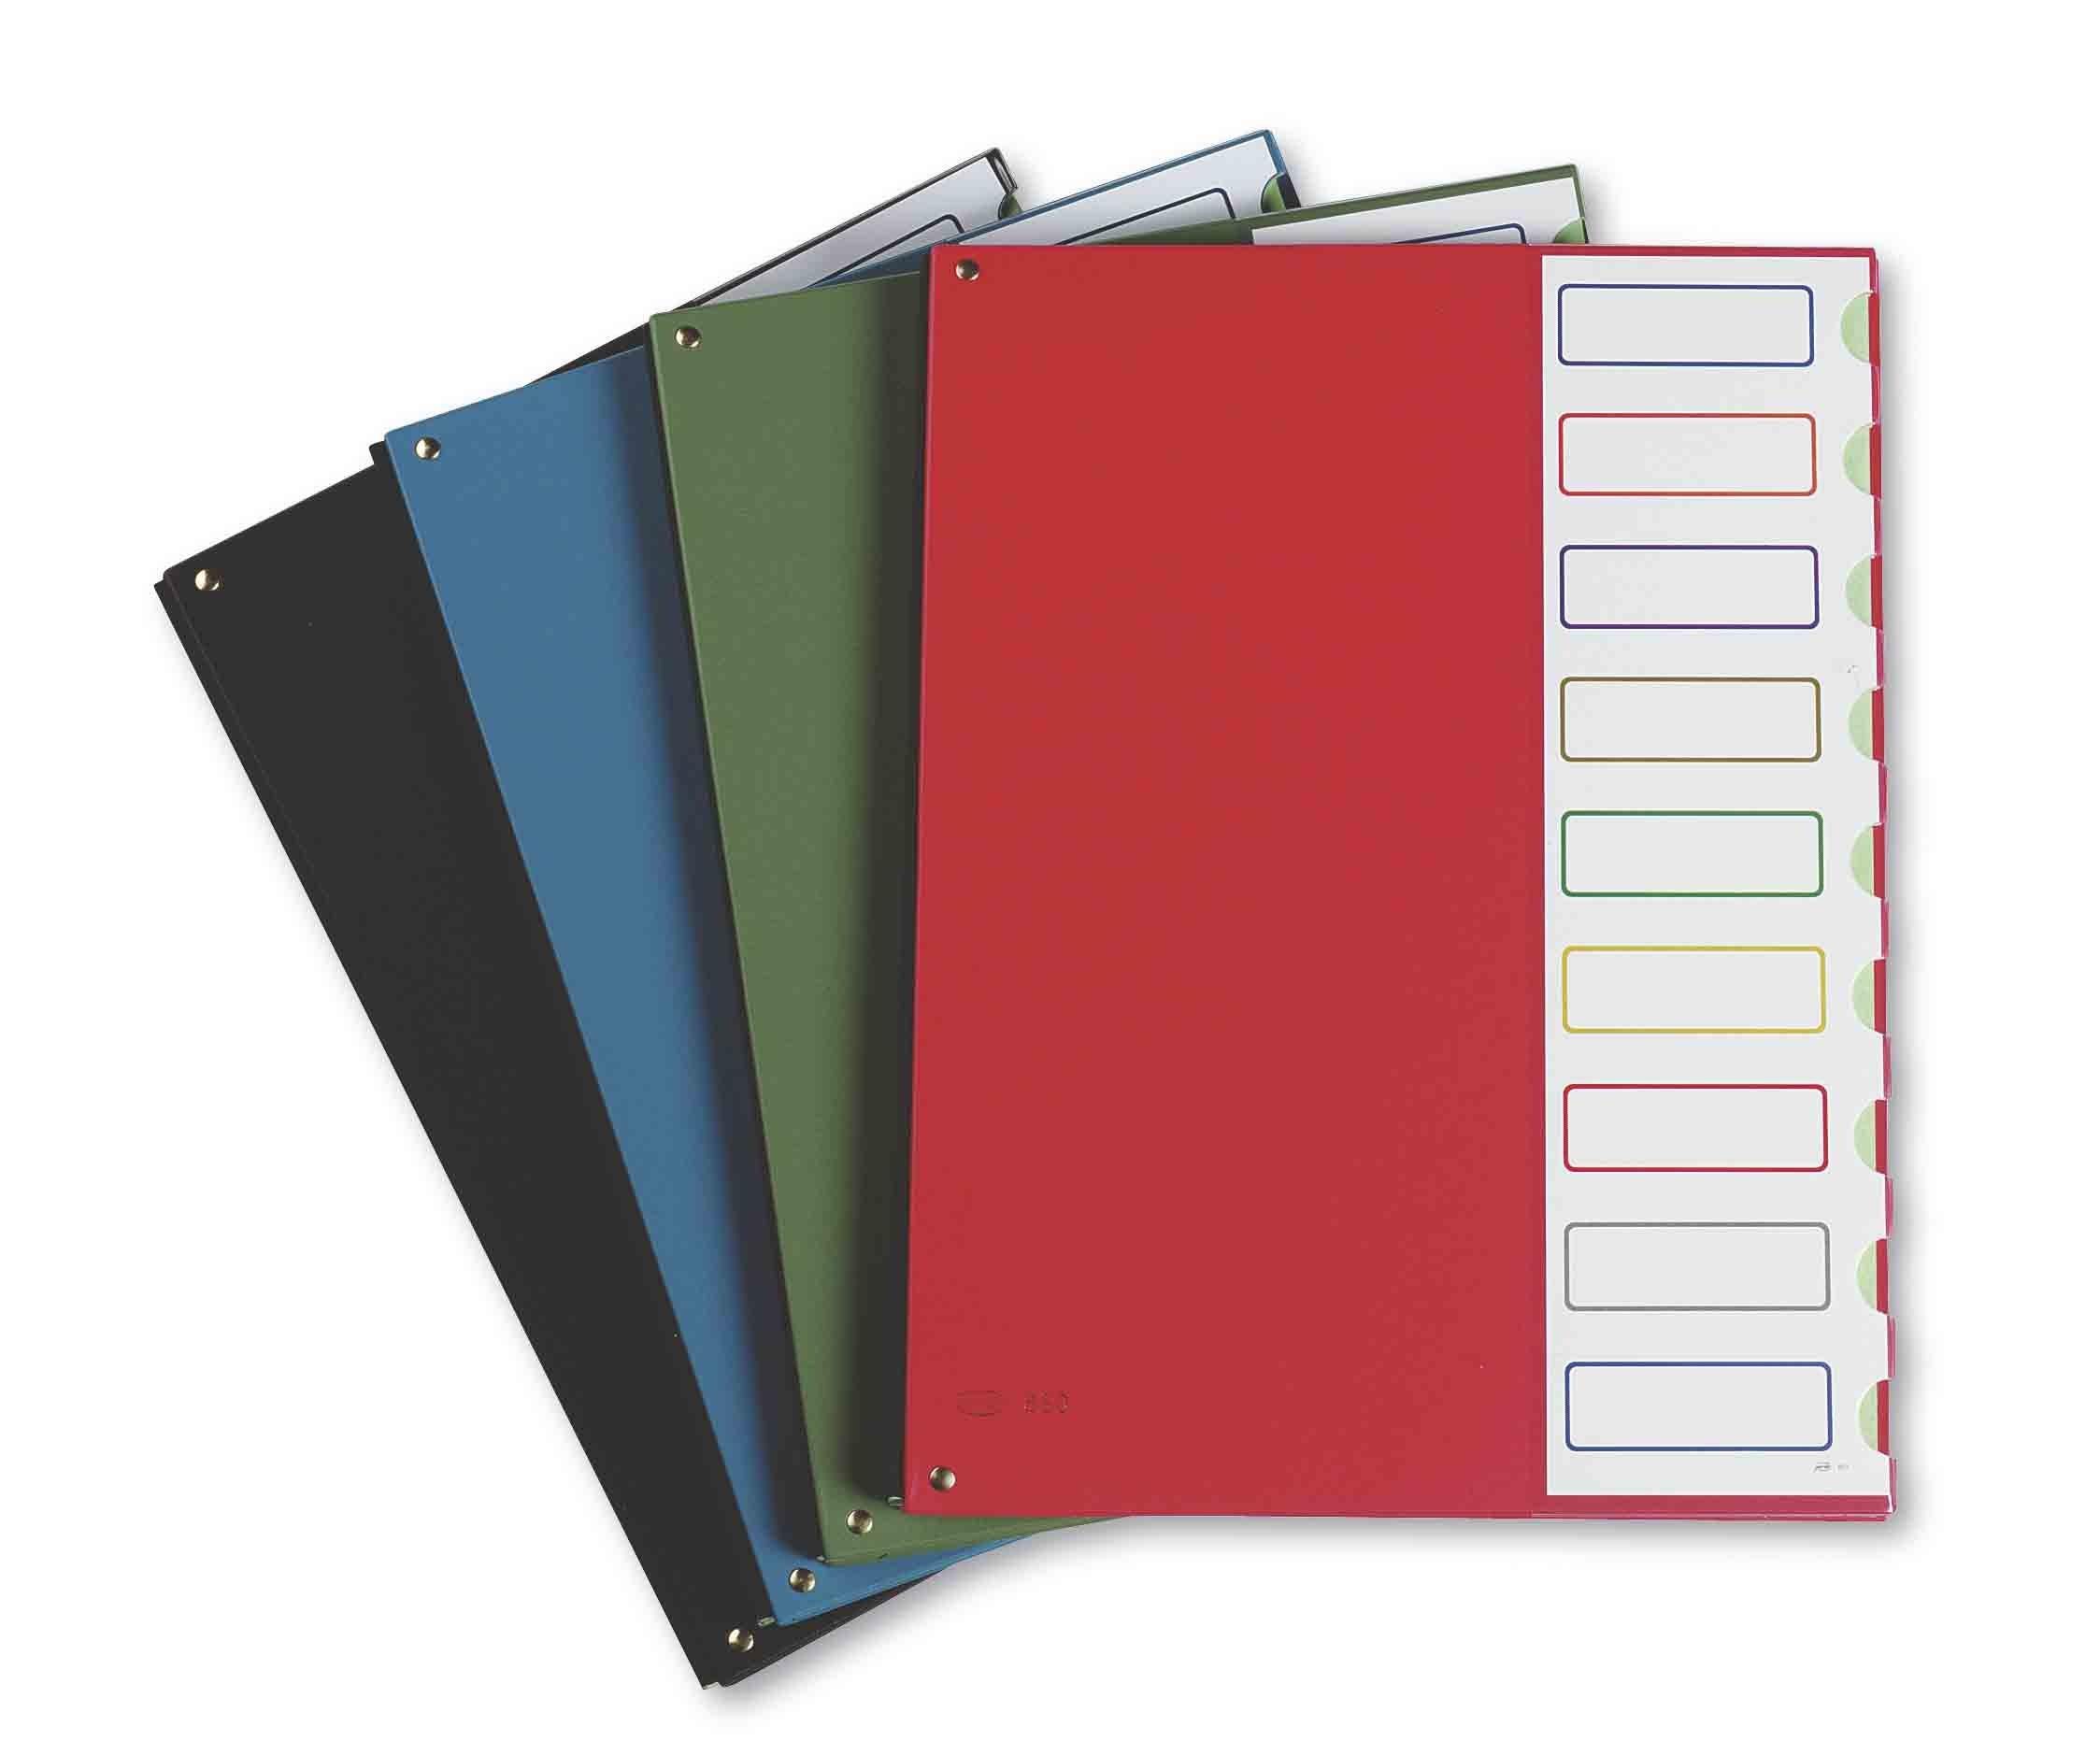 Pardo 85004–Clasificador Covered Plastic 9Compartments Closing Erasers, Green